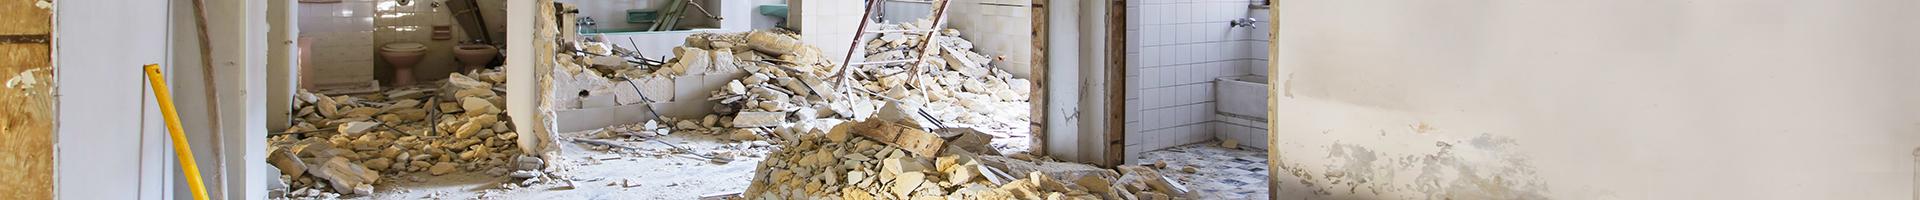 renovation-debris